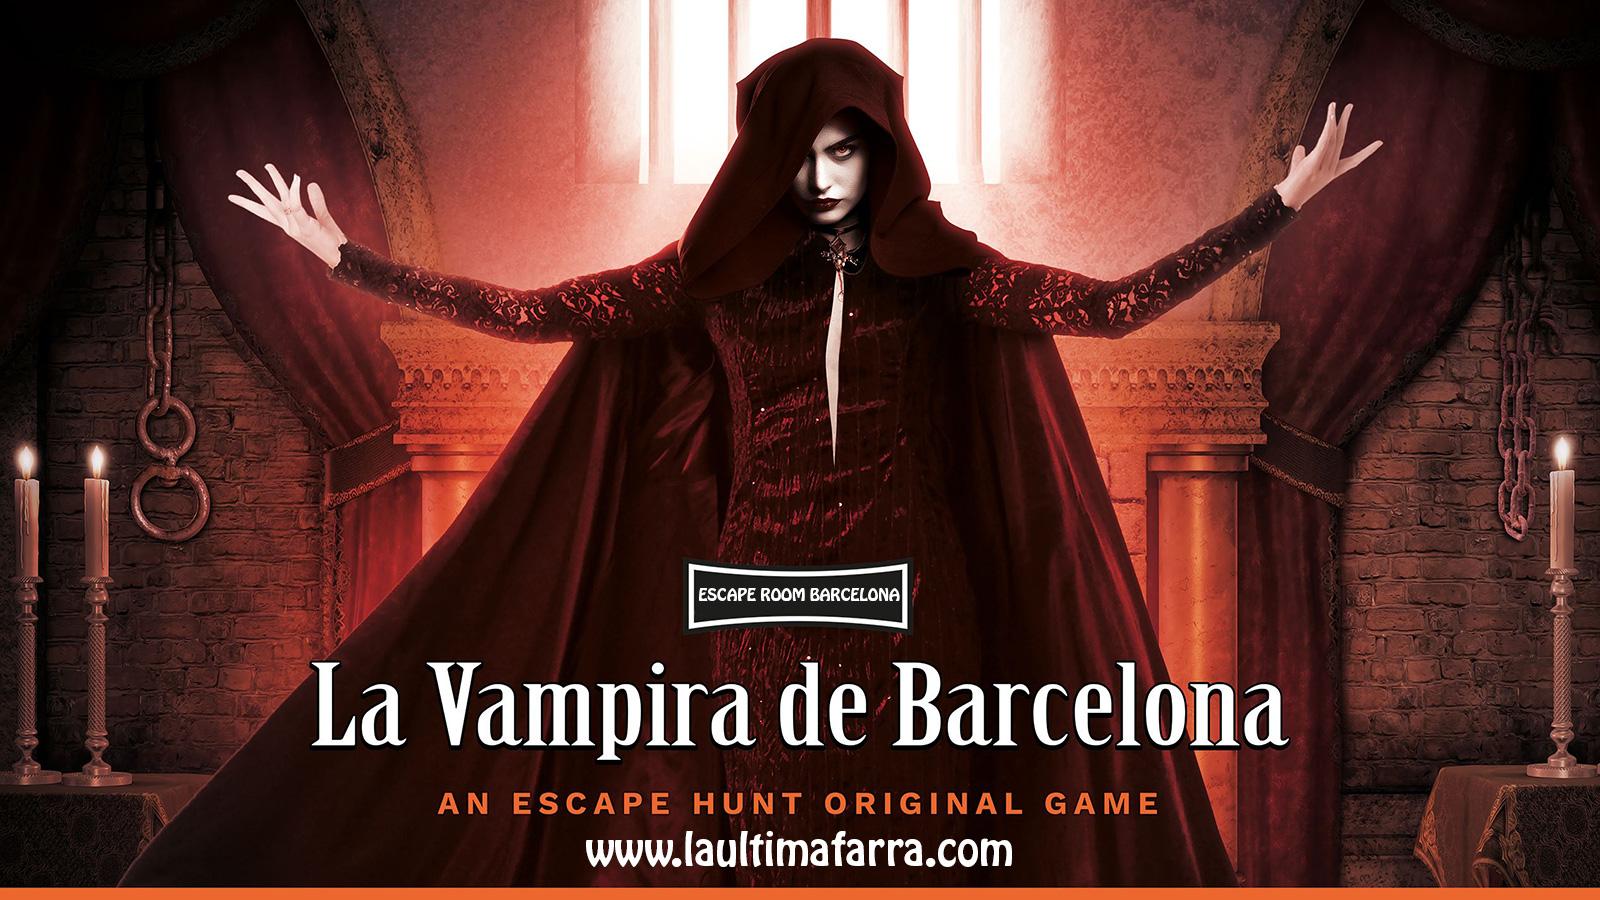 Escape Room Barcelona - La Vampira de Barcelona